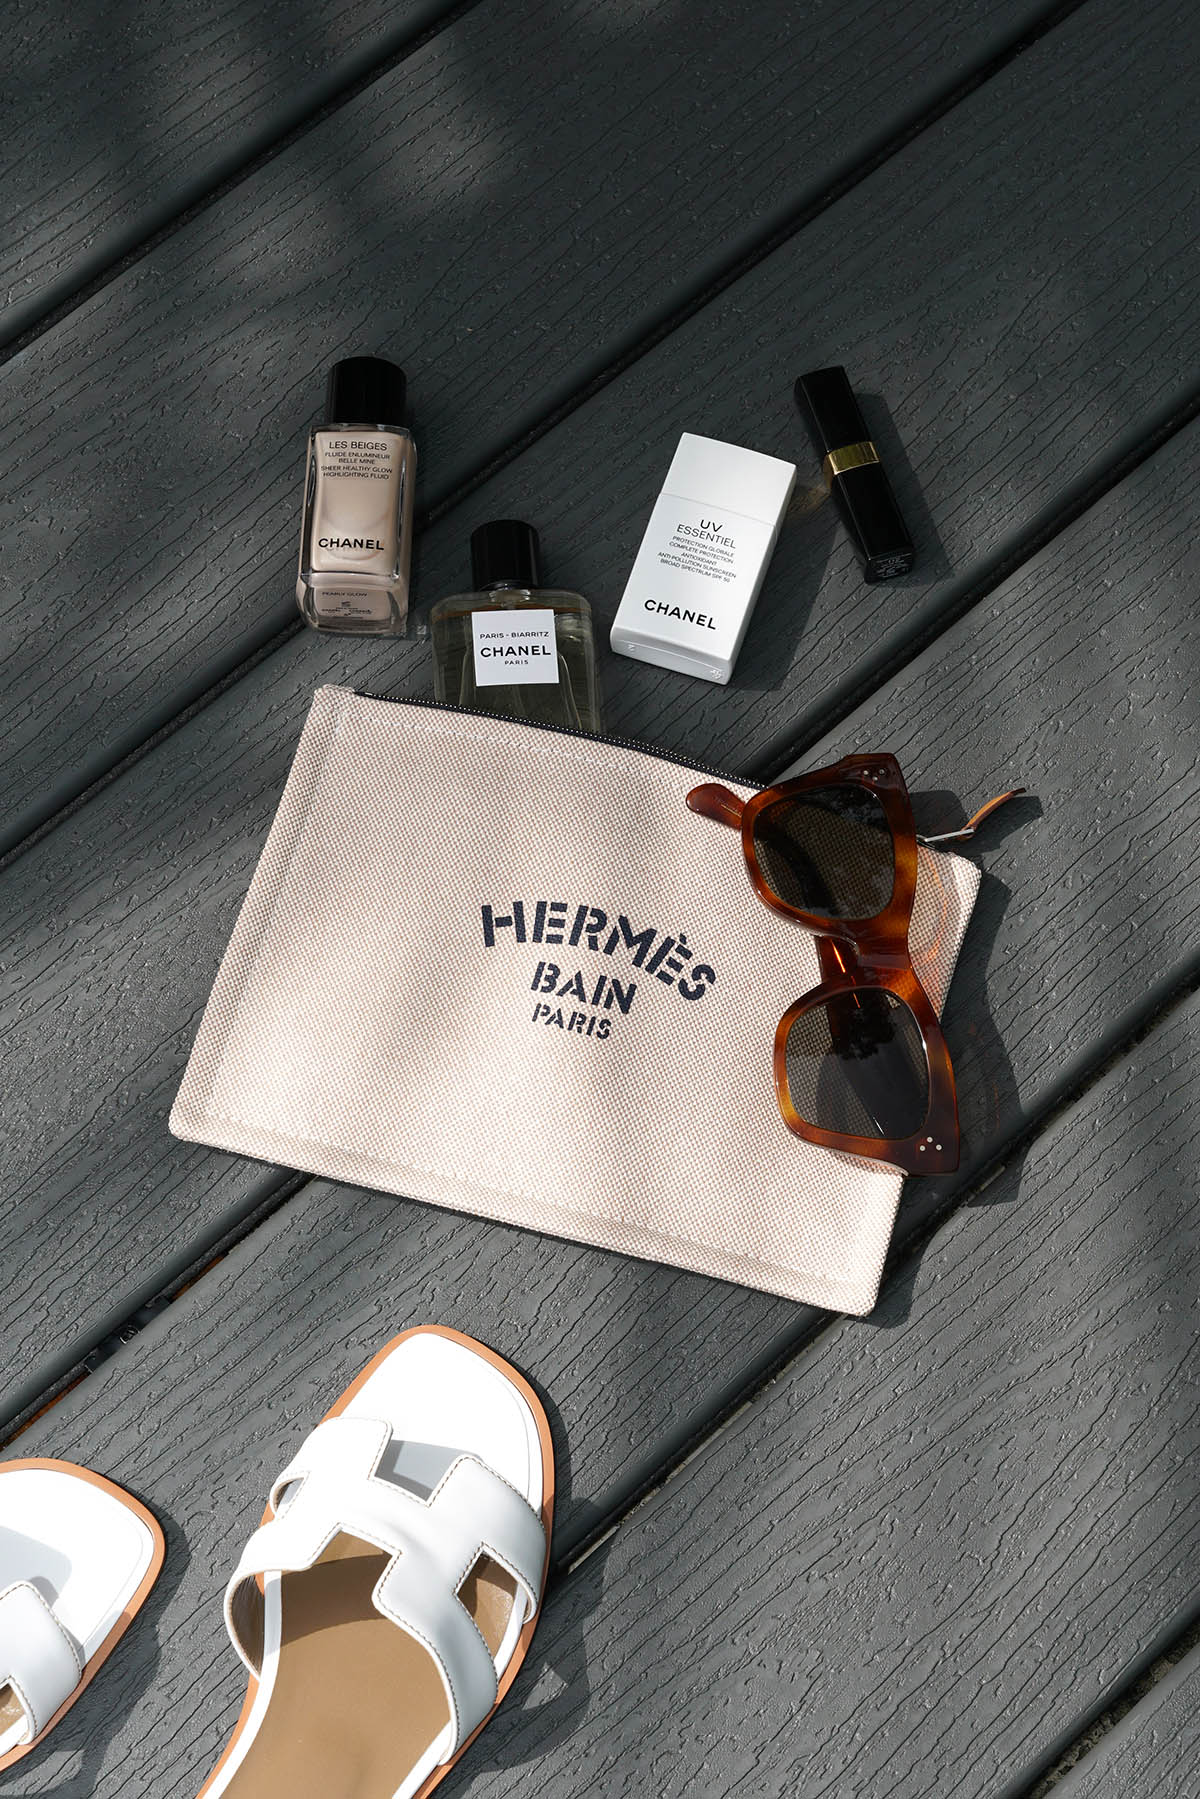 Valise Hermes Bain New Yachting, petit modèle